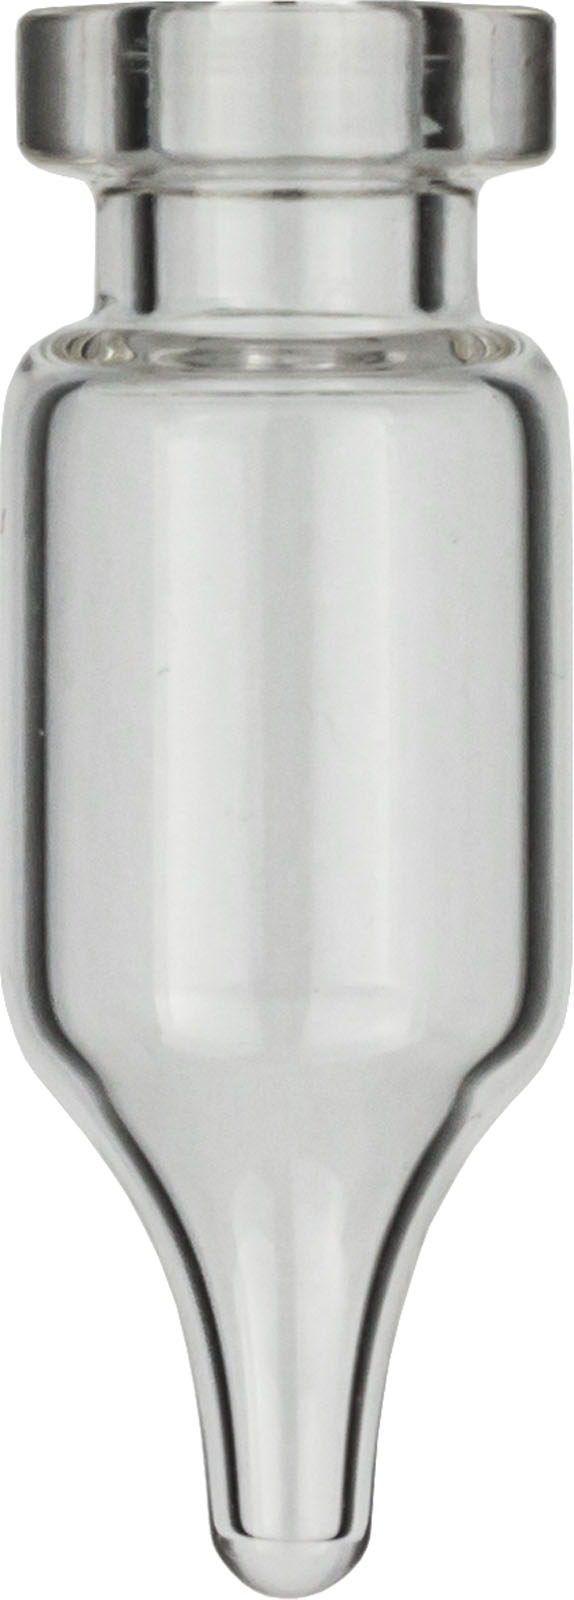 Vial N11-1.1, RR, k, 11,6x32, kon.